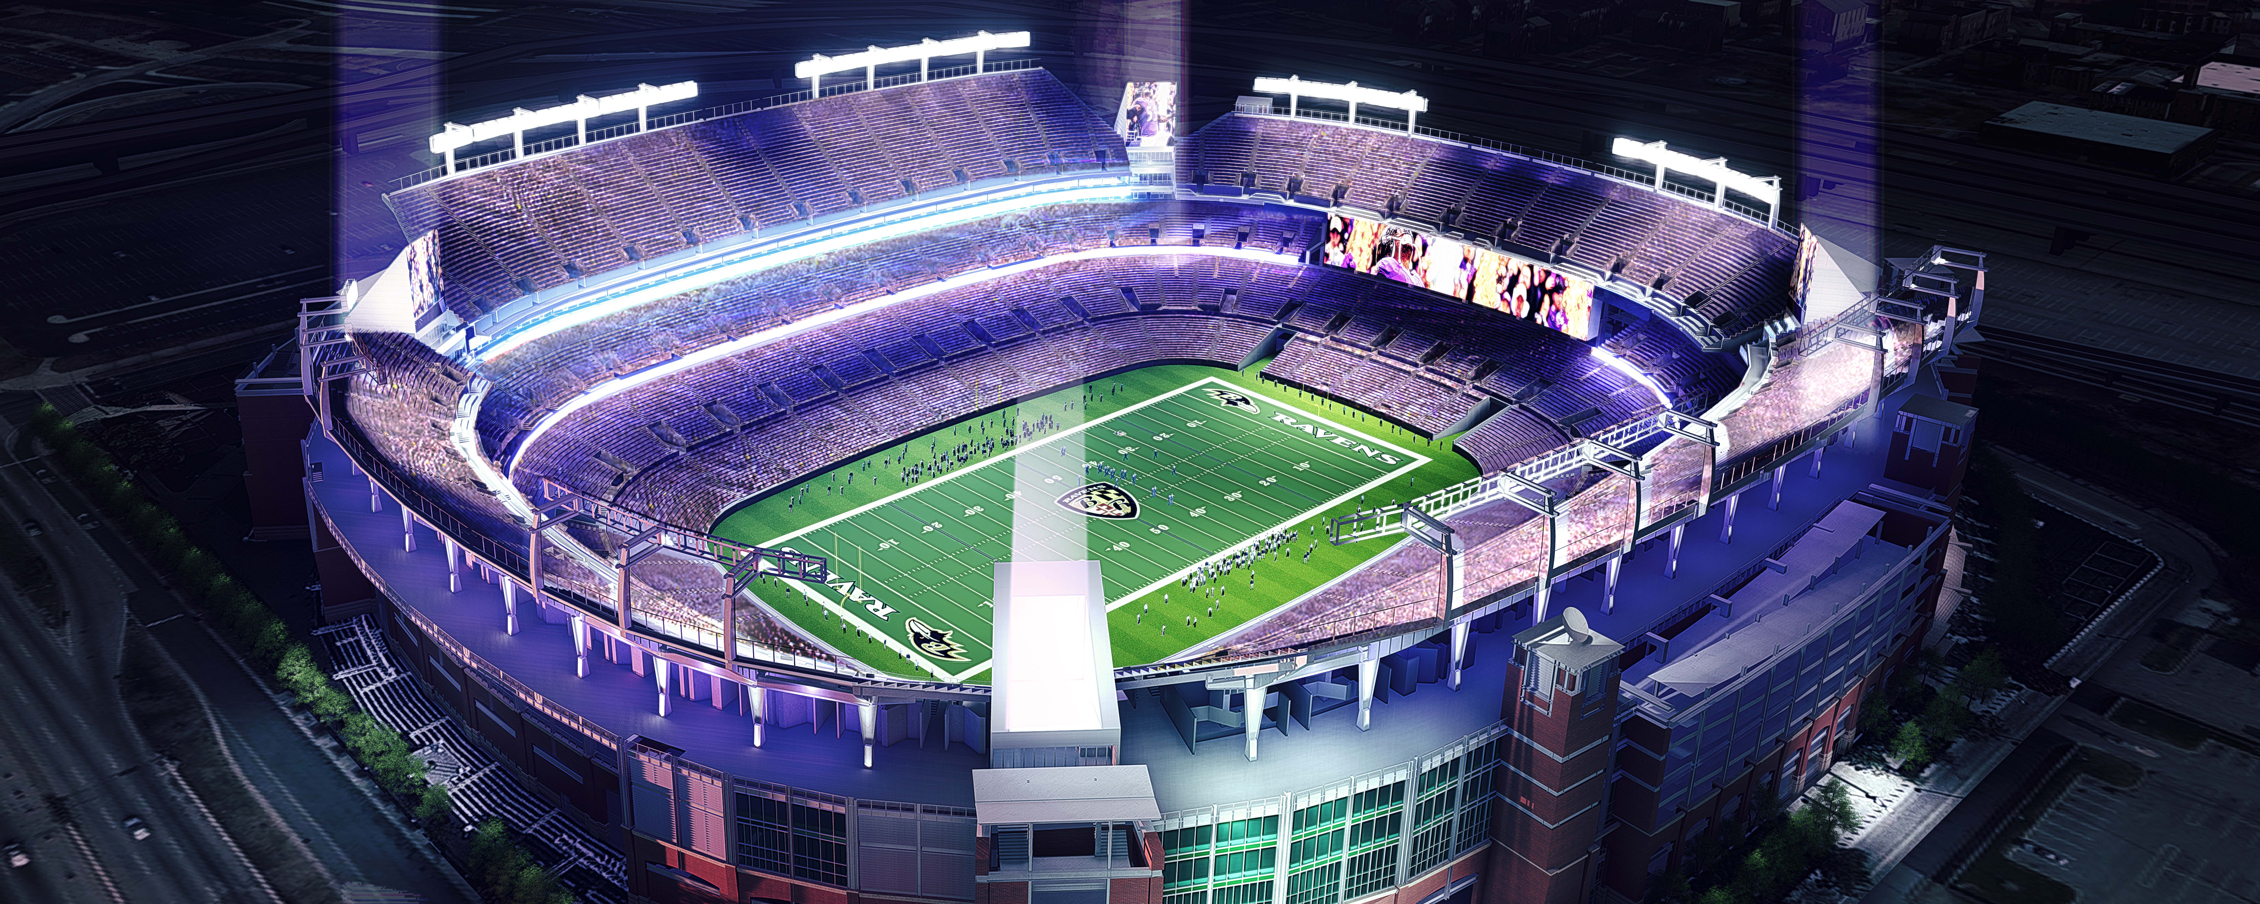 Brandon Etheridge S Home Field Advantage With The Baltimore Ravens